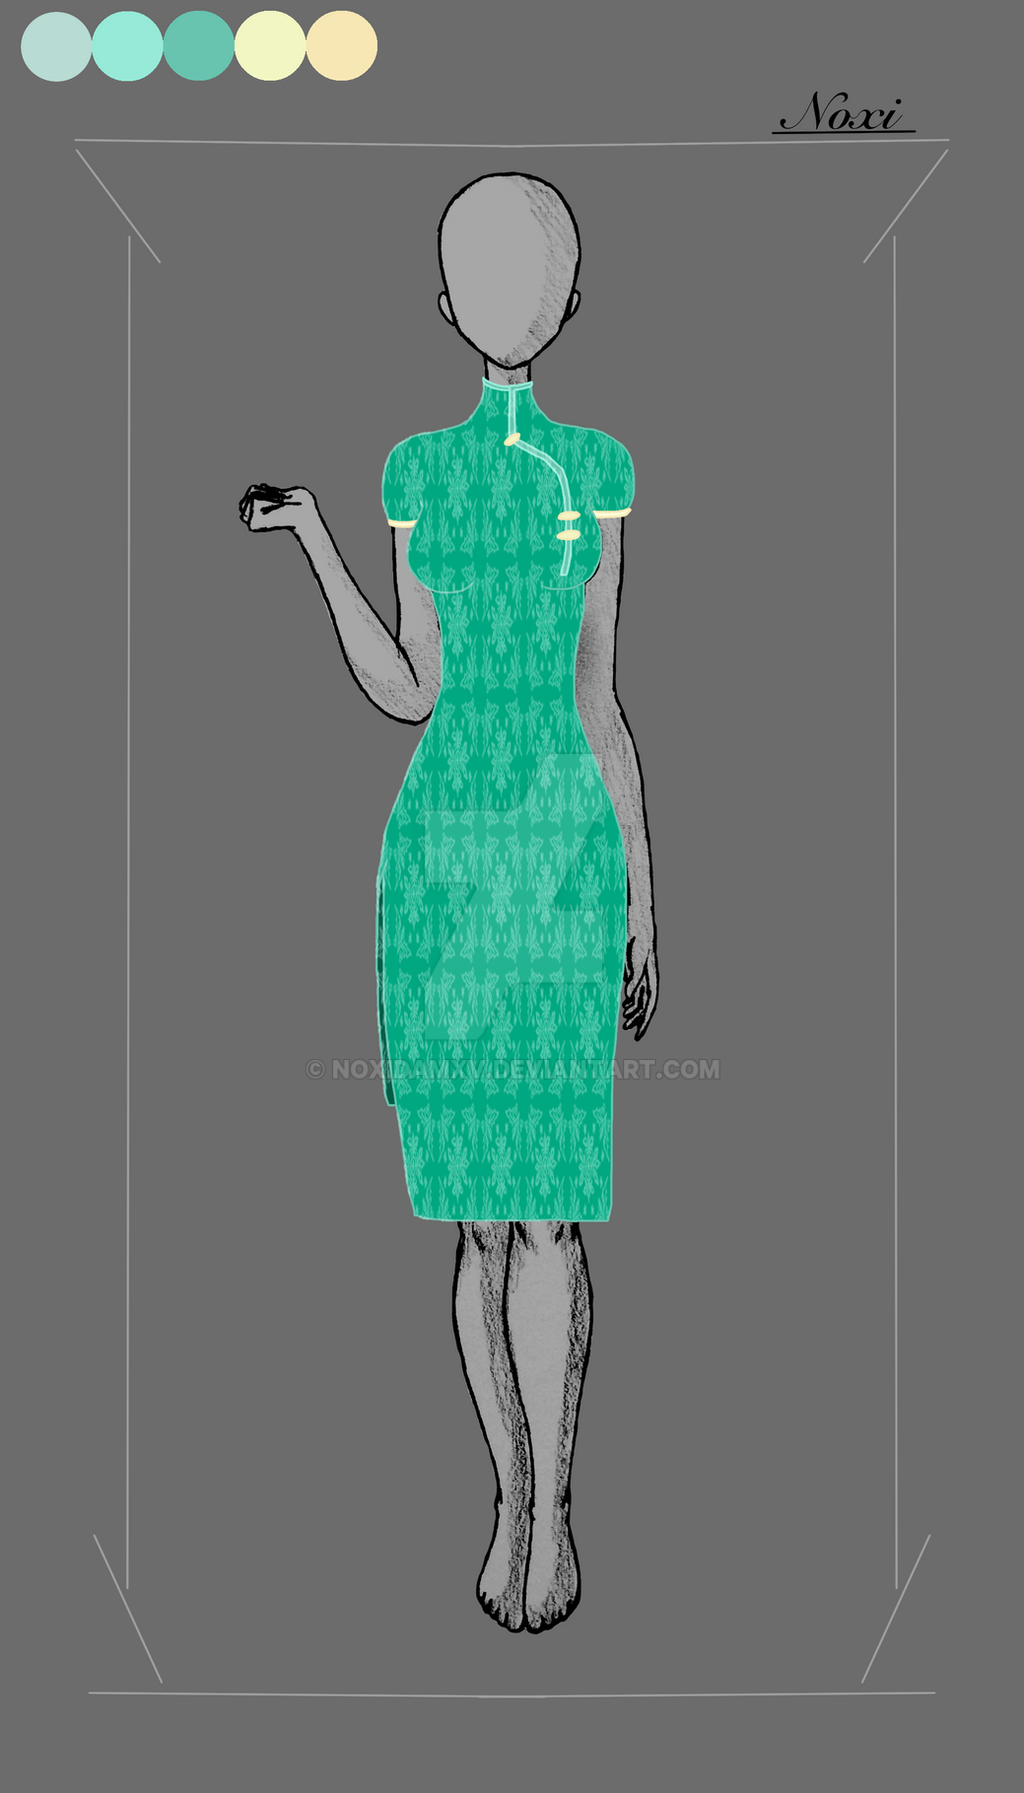 Nomi's Dress by NoxidamXV